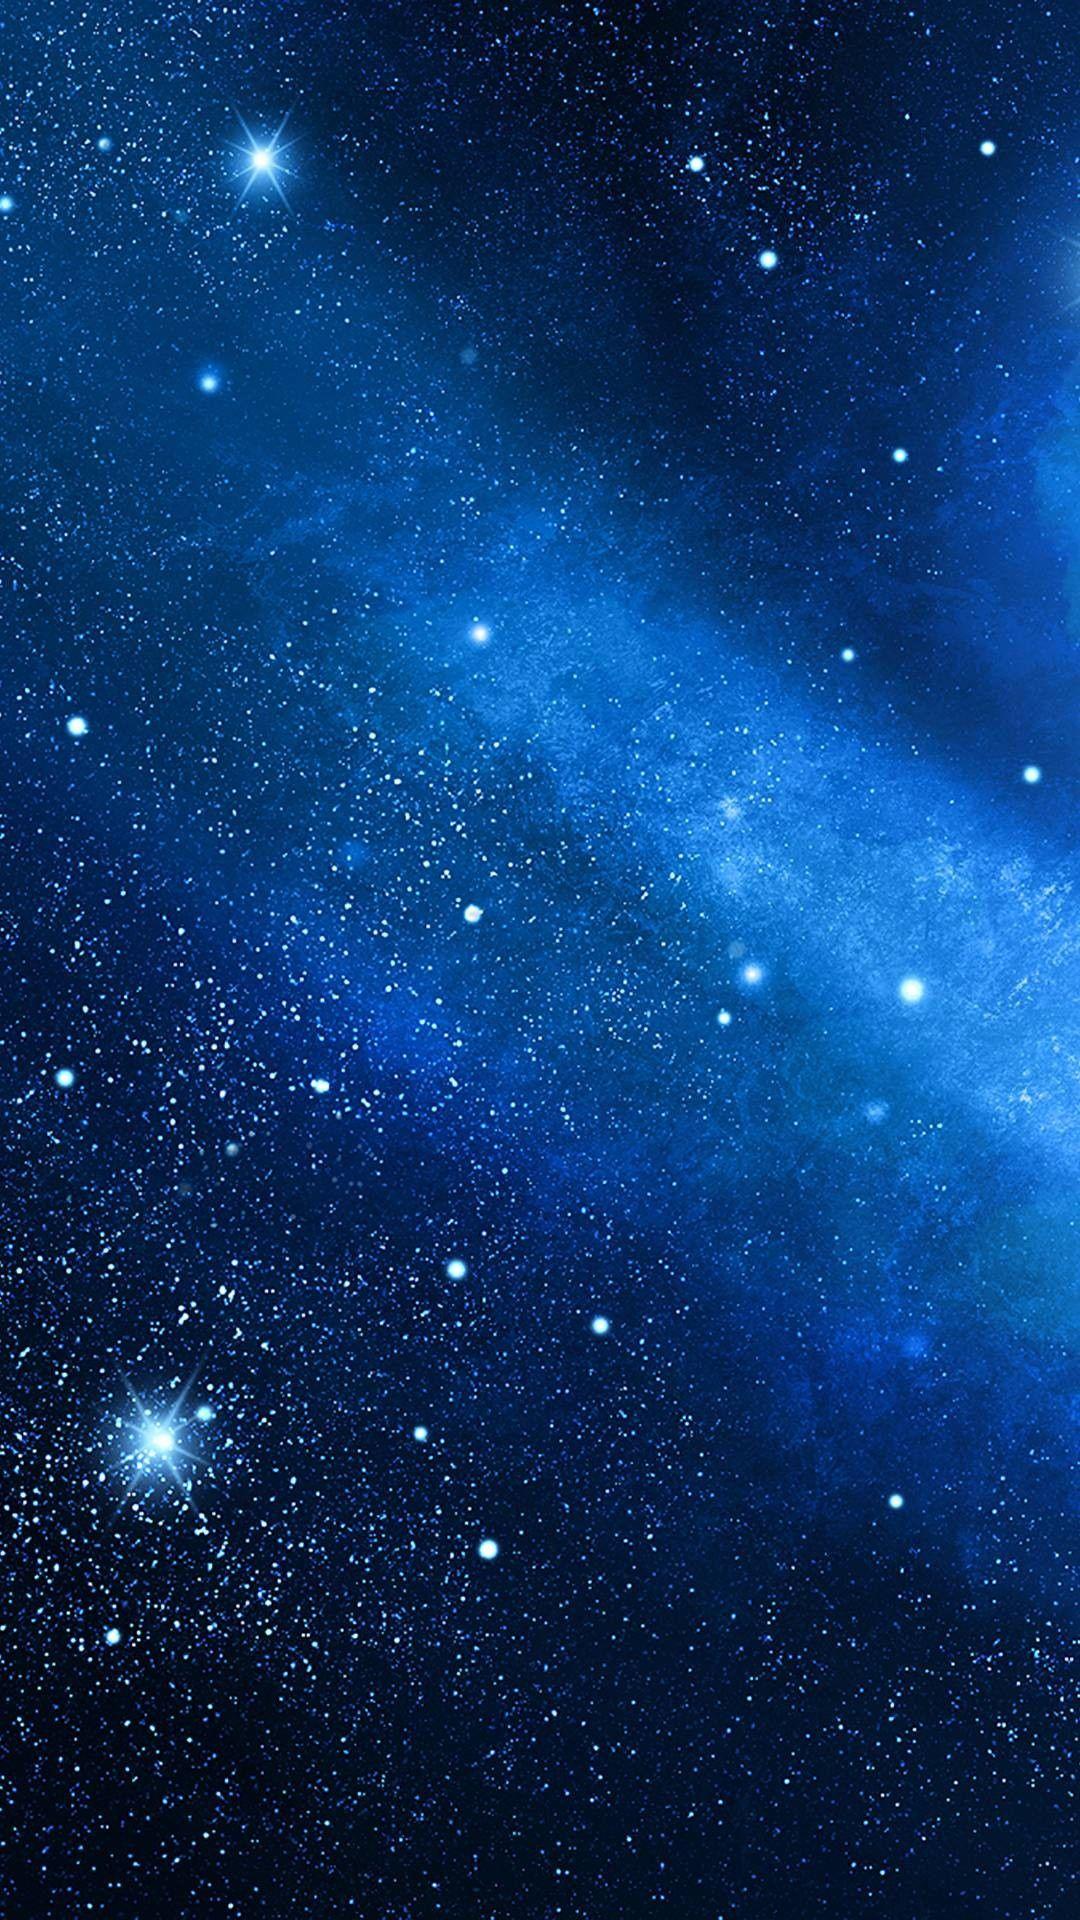 Galaxy Wallpaper Hupages Download Iphone Wallpapers Blue Galaxy Wallpaper Dark Blue Wallpaper Hd Galaxy Wallpaper